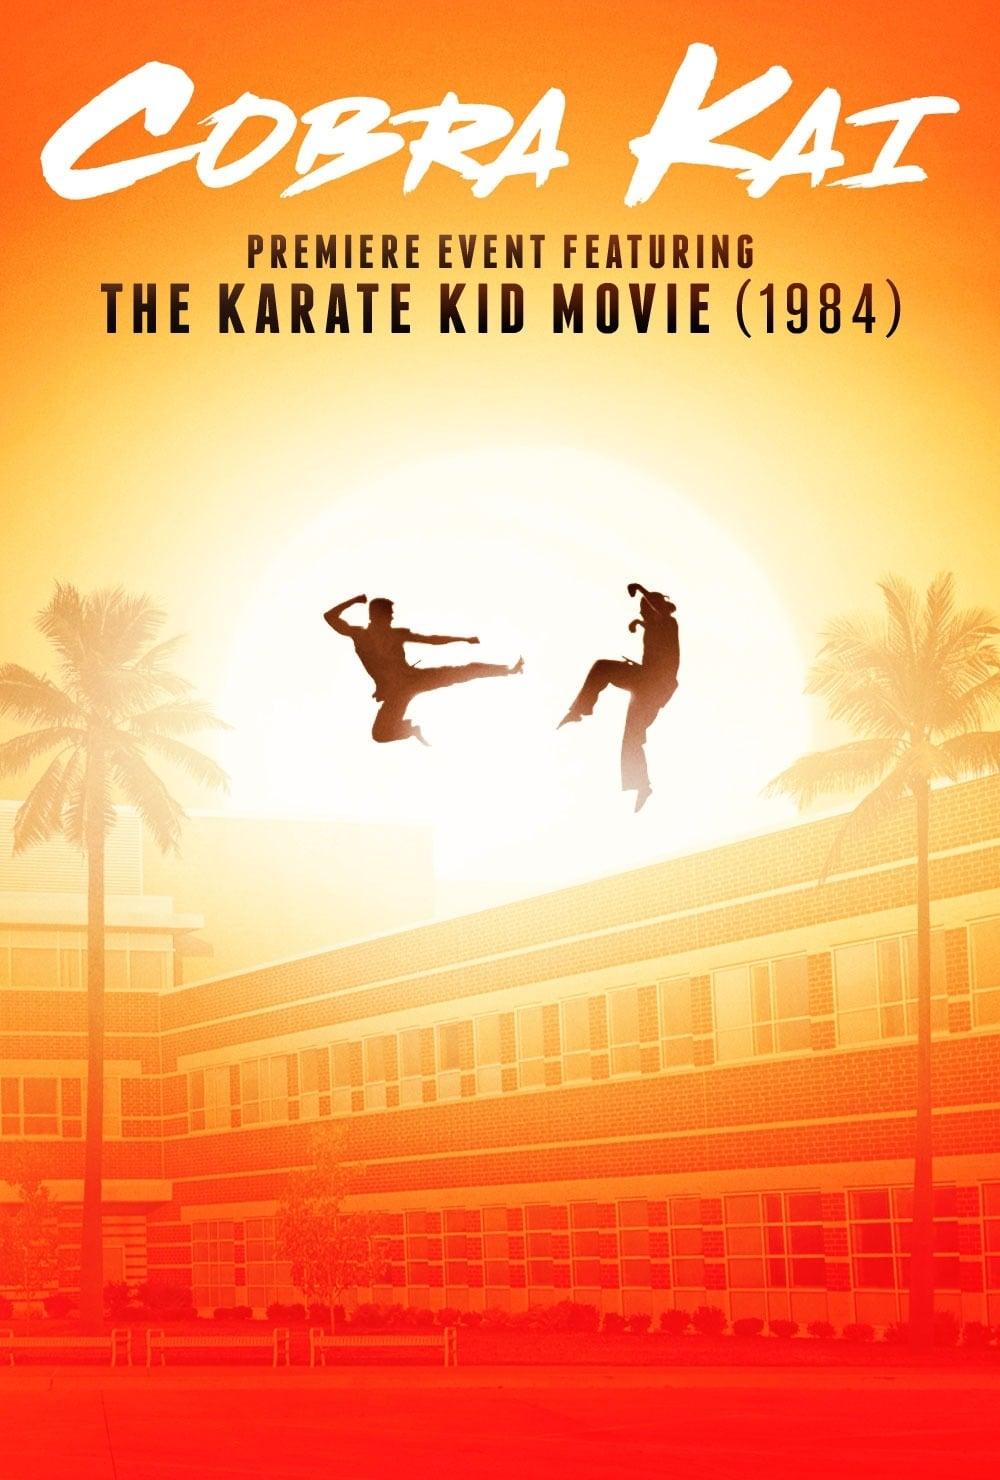 Ver Cobra Kai Premiere feat. Karate Kid Online HD Español ()